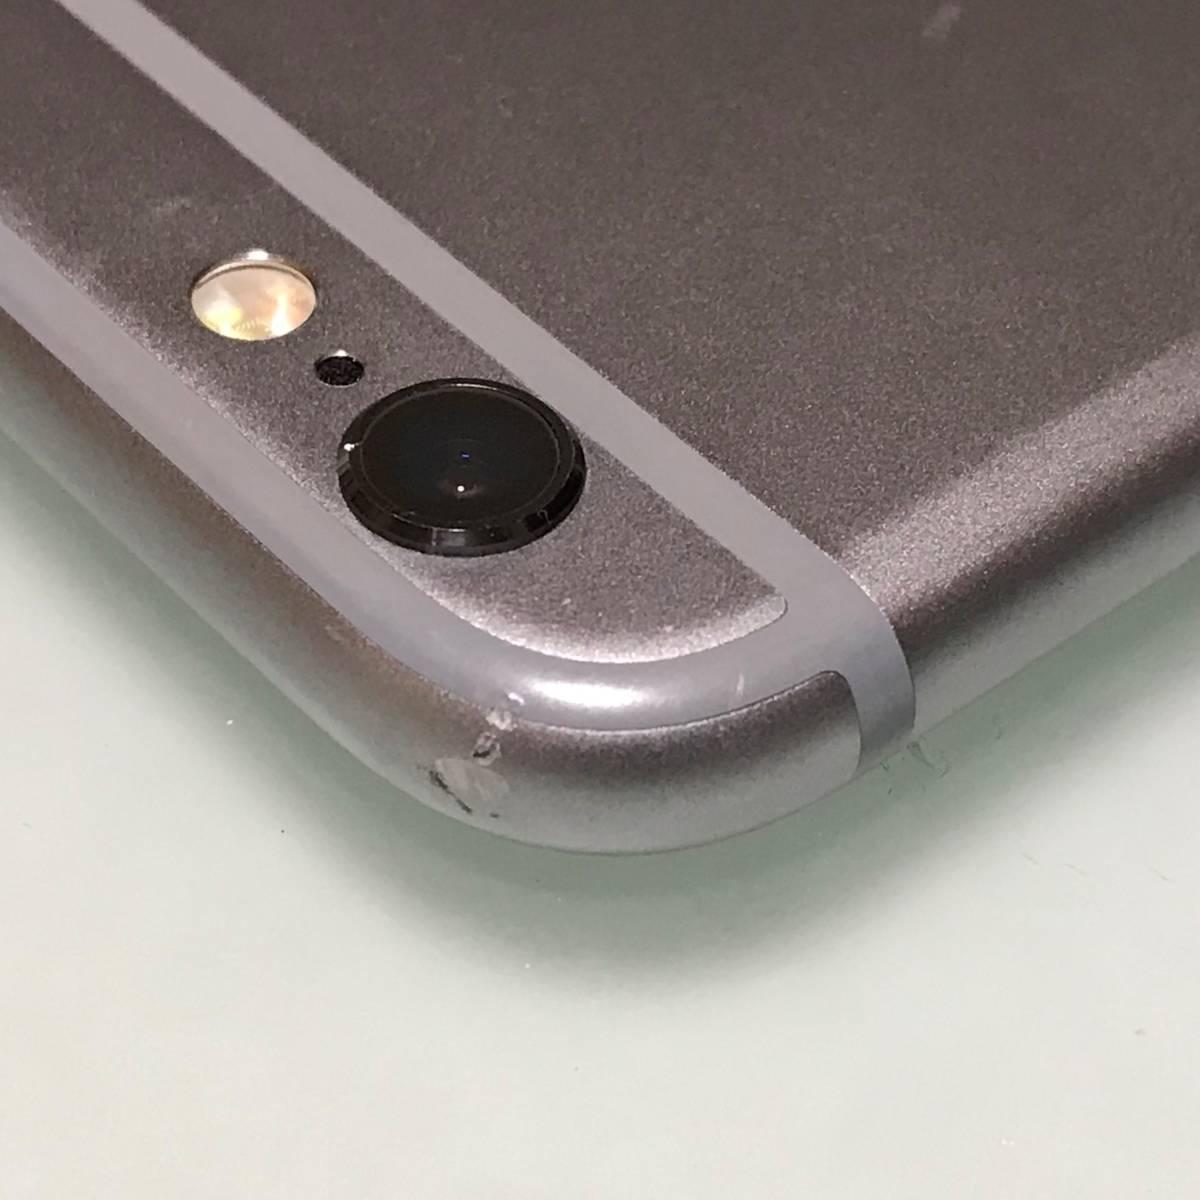 SIMフリー iPhone 6S スペースグレイ 128GB MKQT2J/A バッテリー容量100% アクティベーションロック解除済 docomo MVNO可 SIMロック解除済_画像6